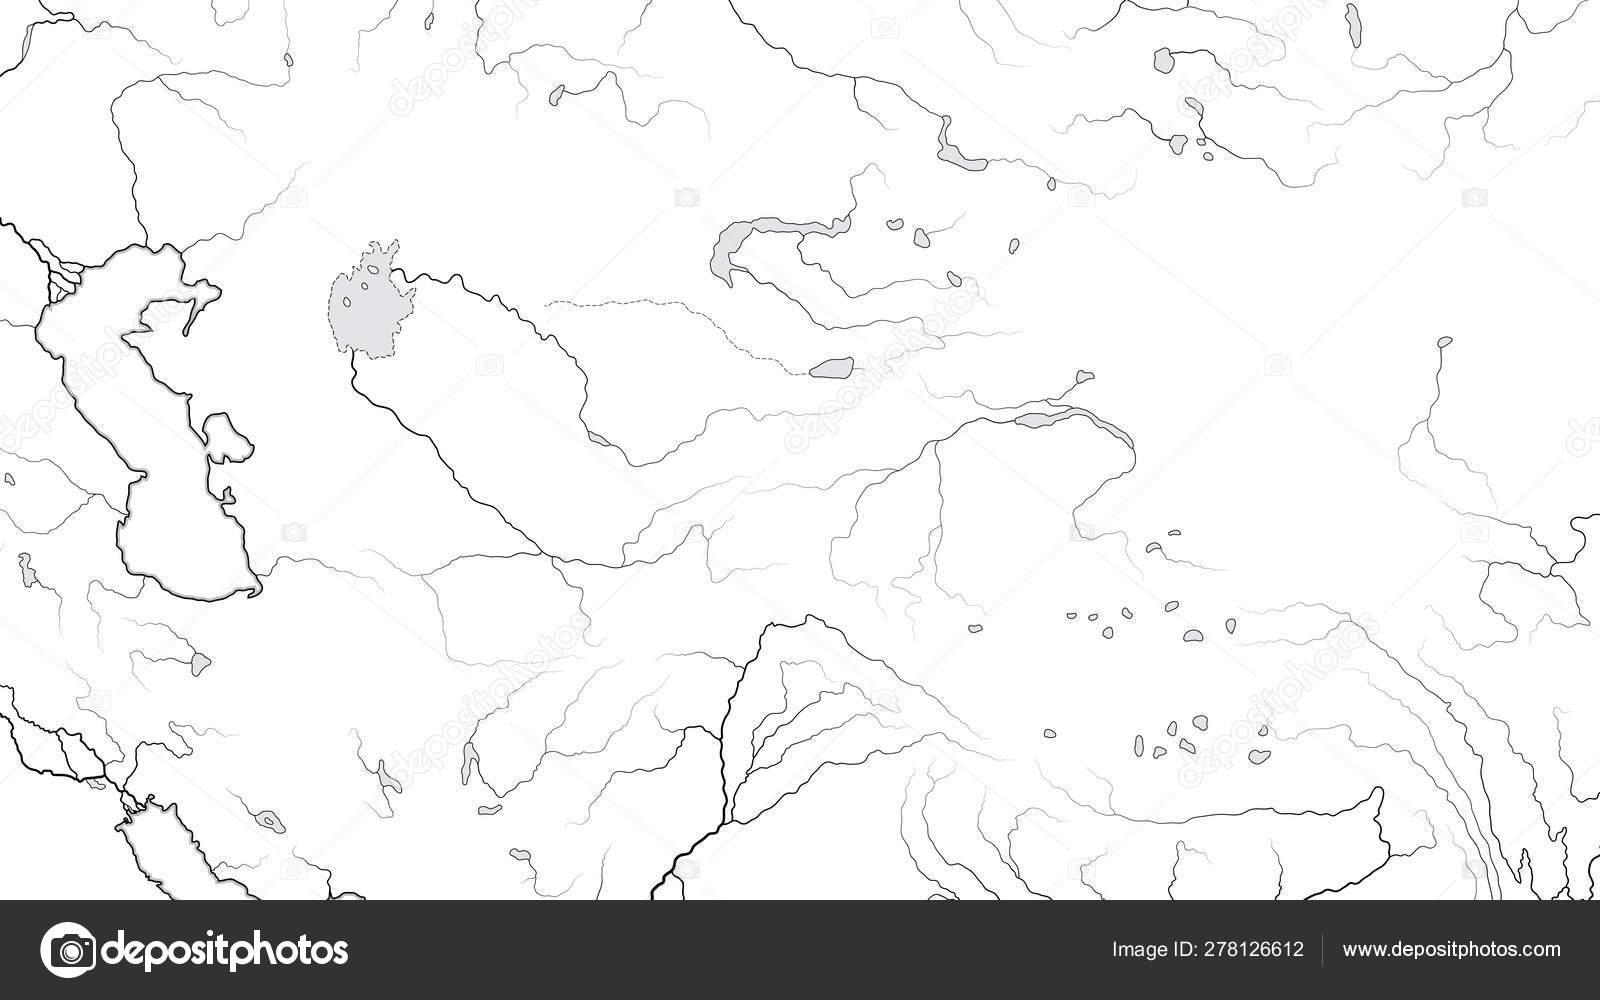 Picture of: World Map Of Central Asia Region Asia Interior Kazakhstan Turkmenistan Uzbekistan Turkestan Afghanistan Caspian Sea Karakum Desert Altai Mountains Geographic Chart With Landscape Stock Vector C Photon 278126612